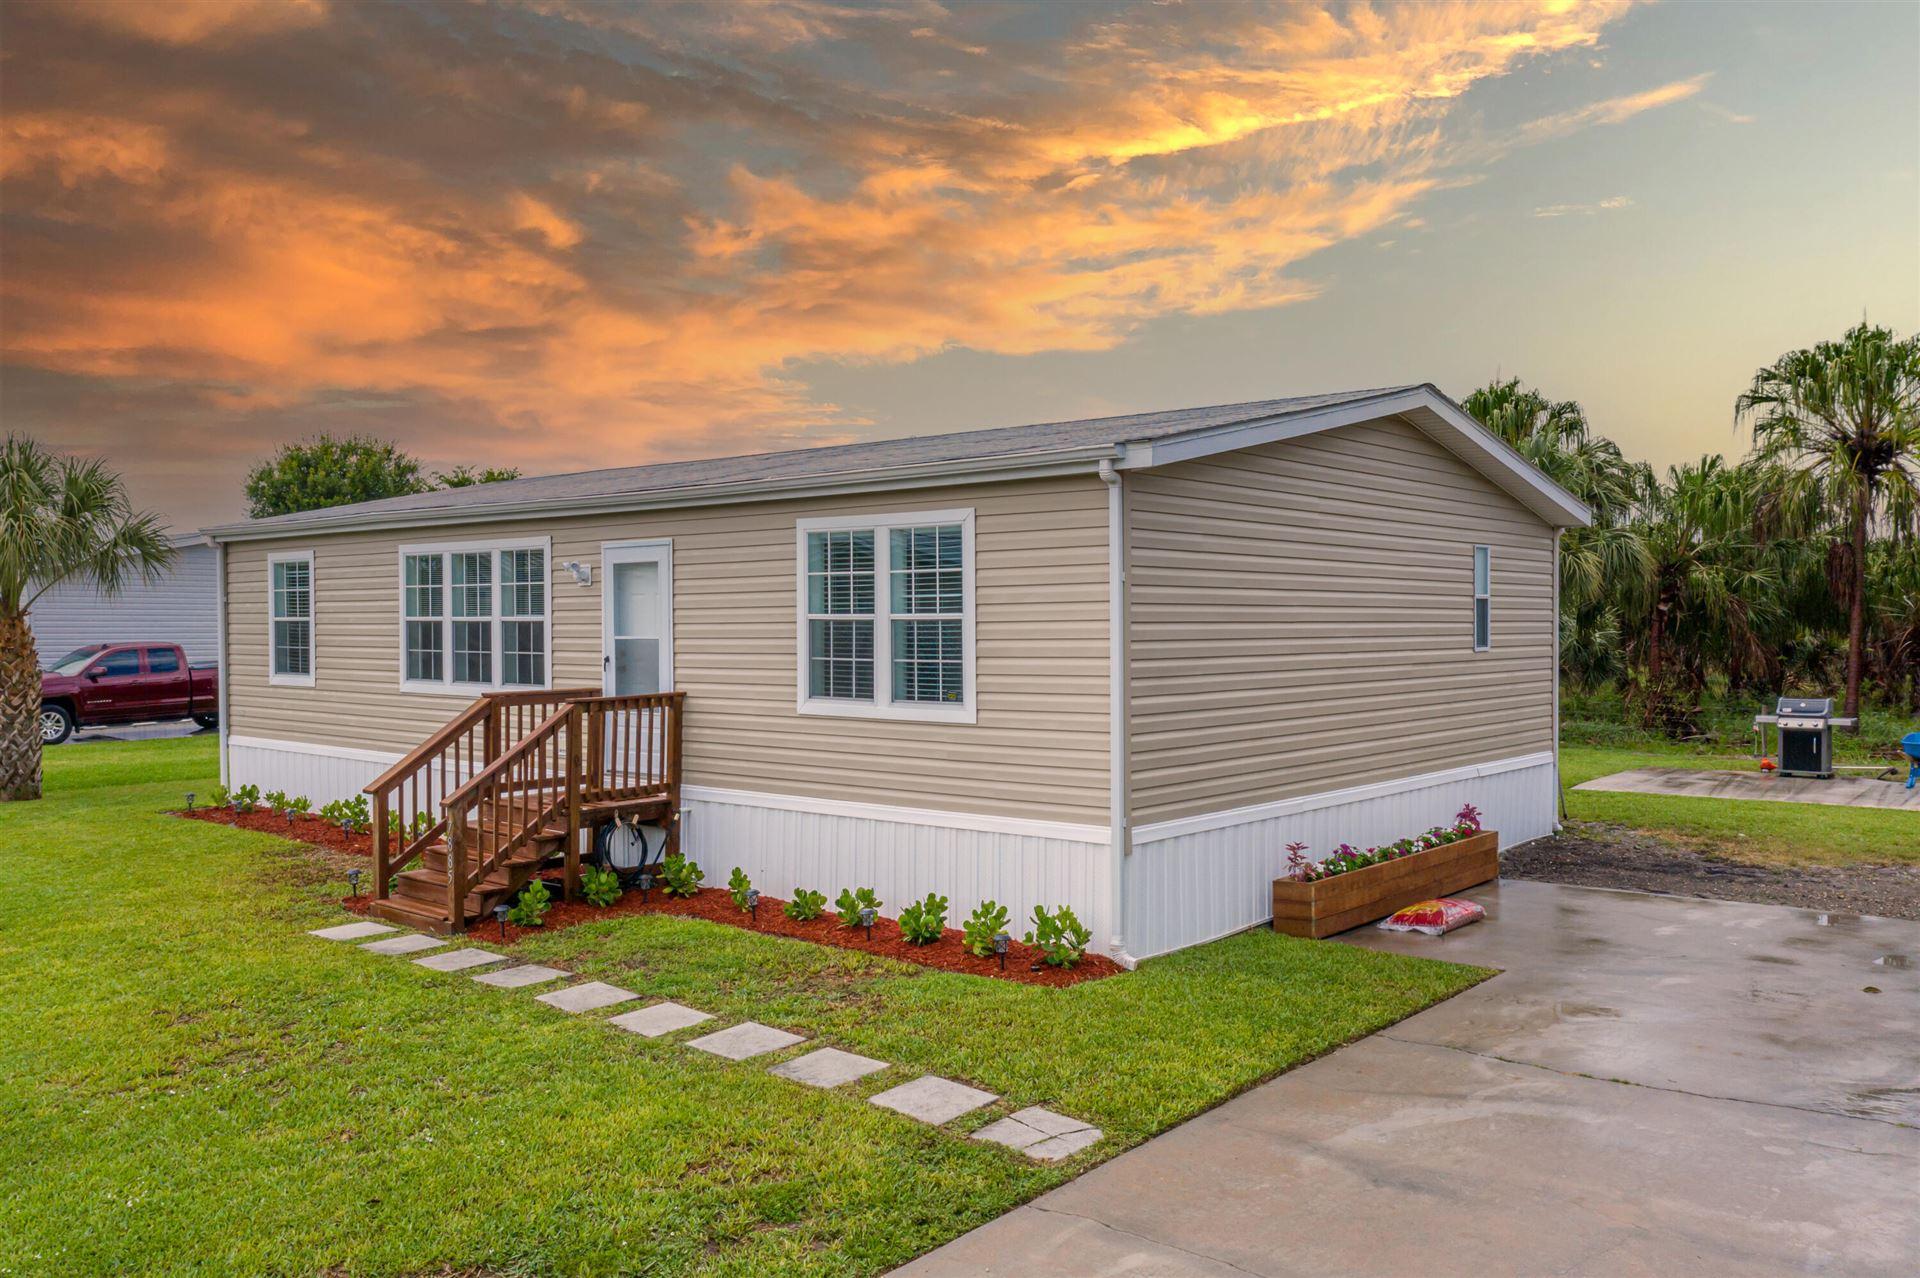 7885 SE 95th Trail, Okeechobee, FL 34974 - MLS#: RX-10721662